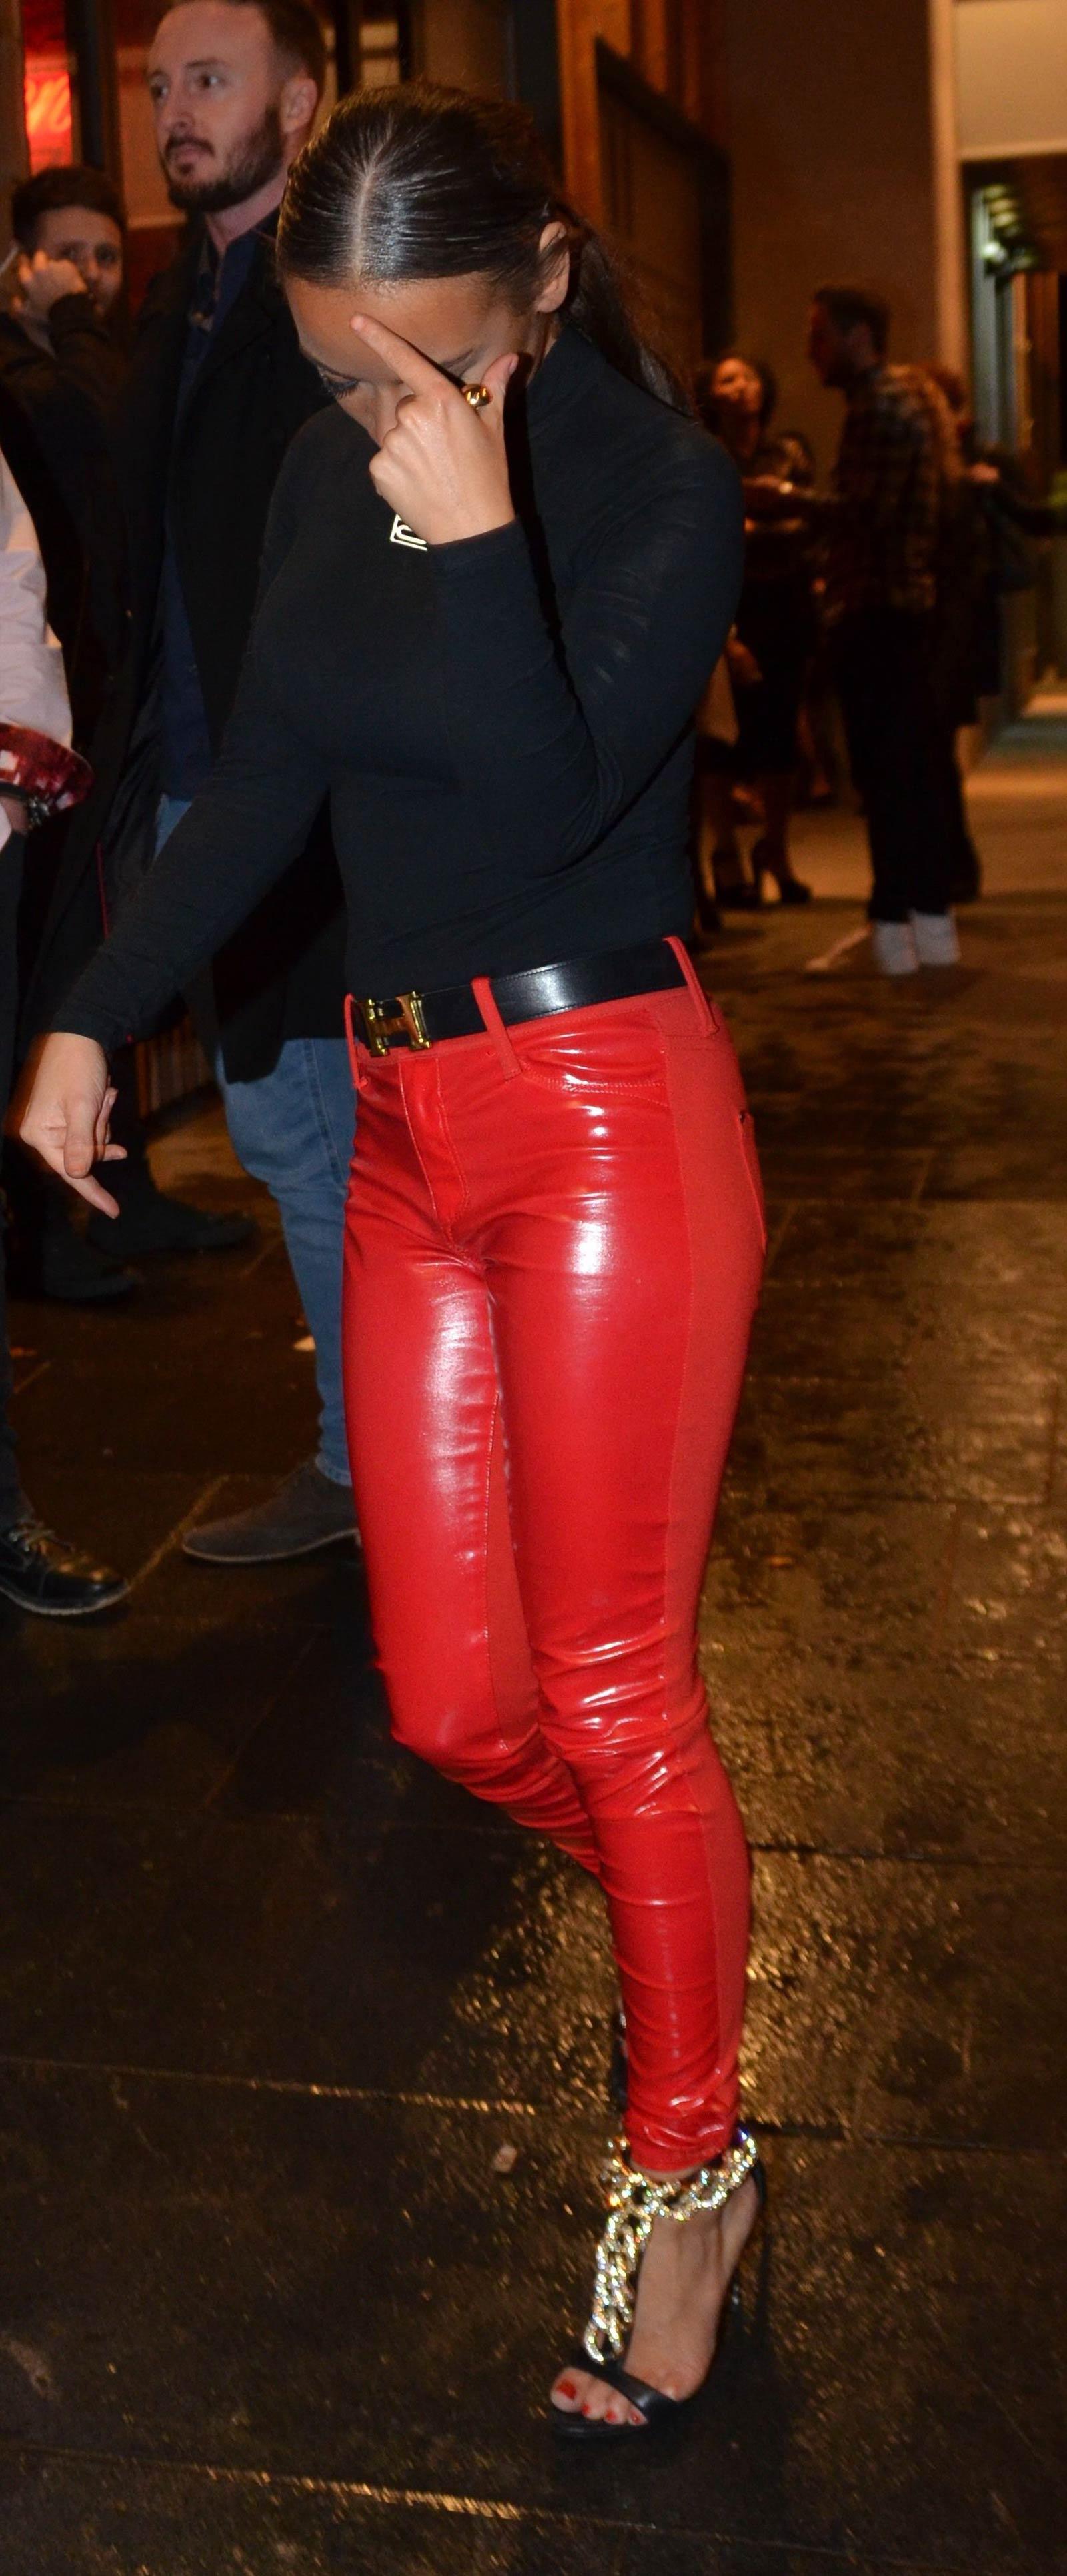 Chelsee Healey leaving The San Carlo Restaurant & The Neighbourhood Bar